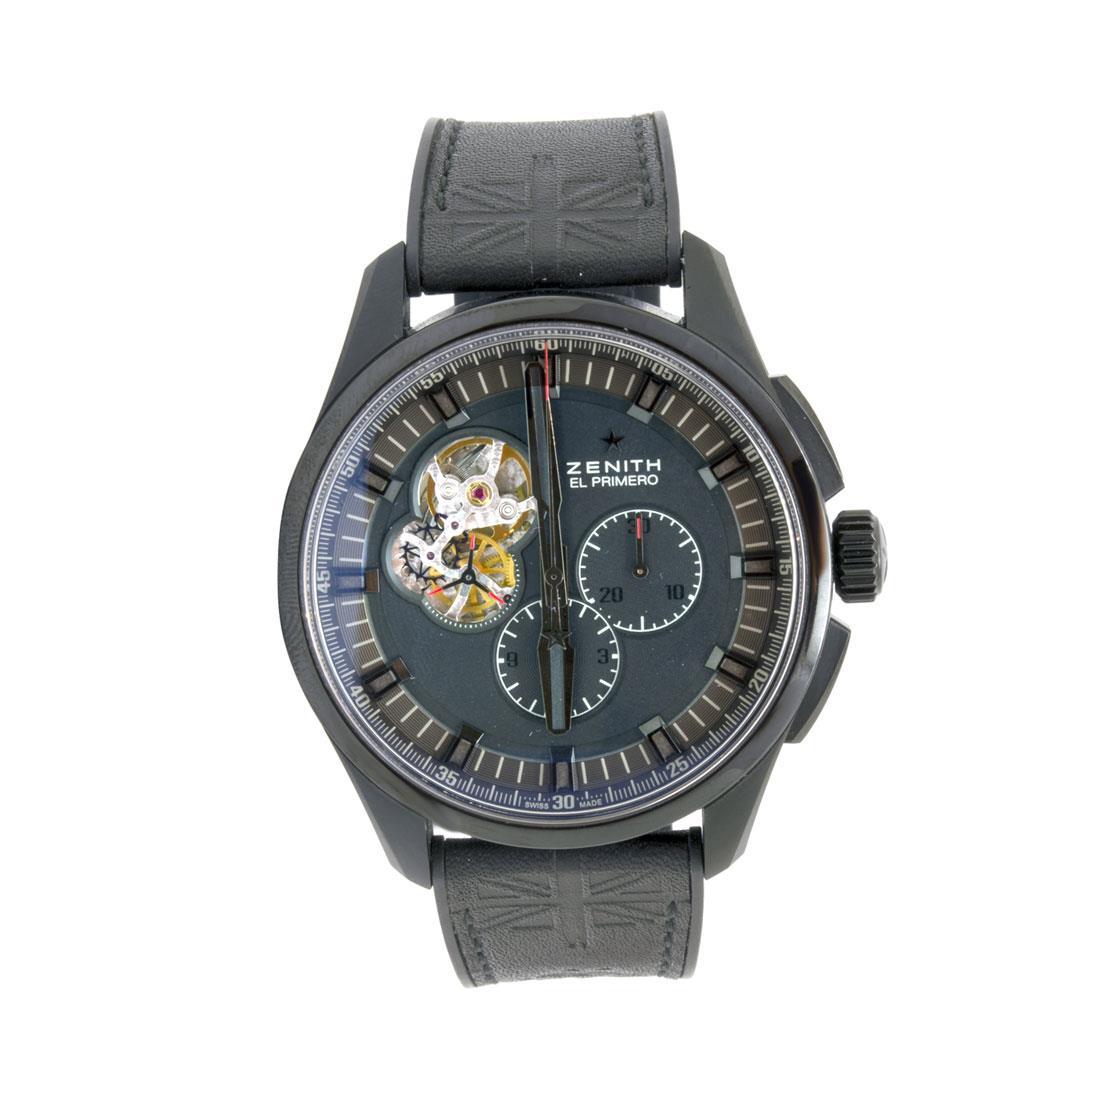 Orologio cassa 42mm in titanio - ZENITH